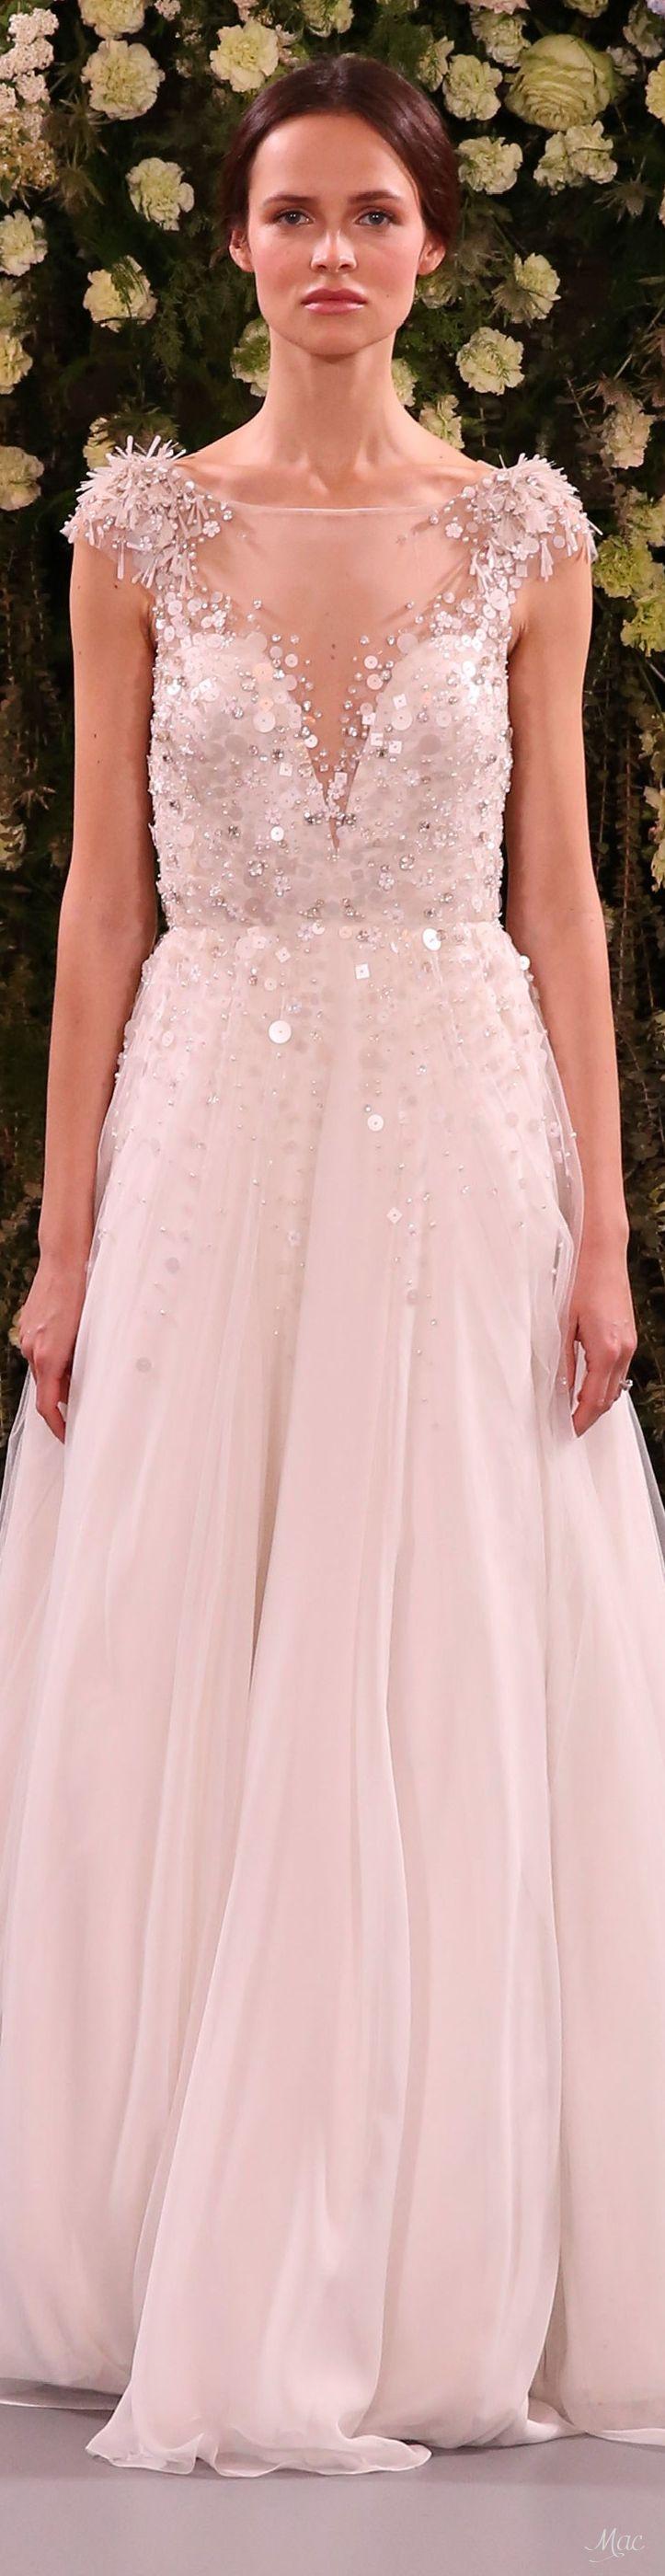 4790 best Abiti da sposa images on Pinterest   Short wedding gowns ...